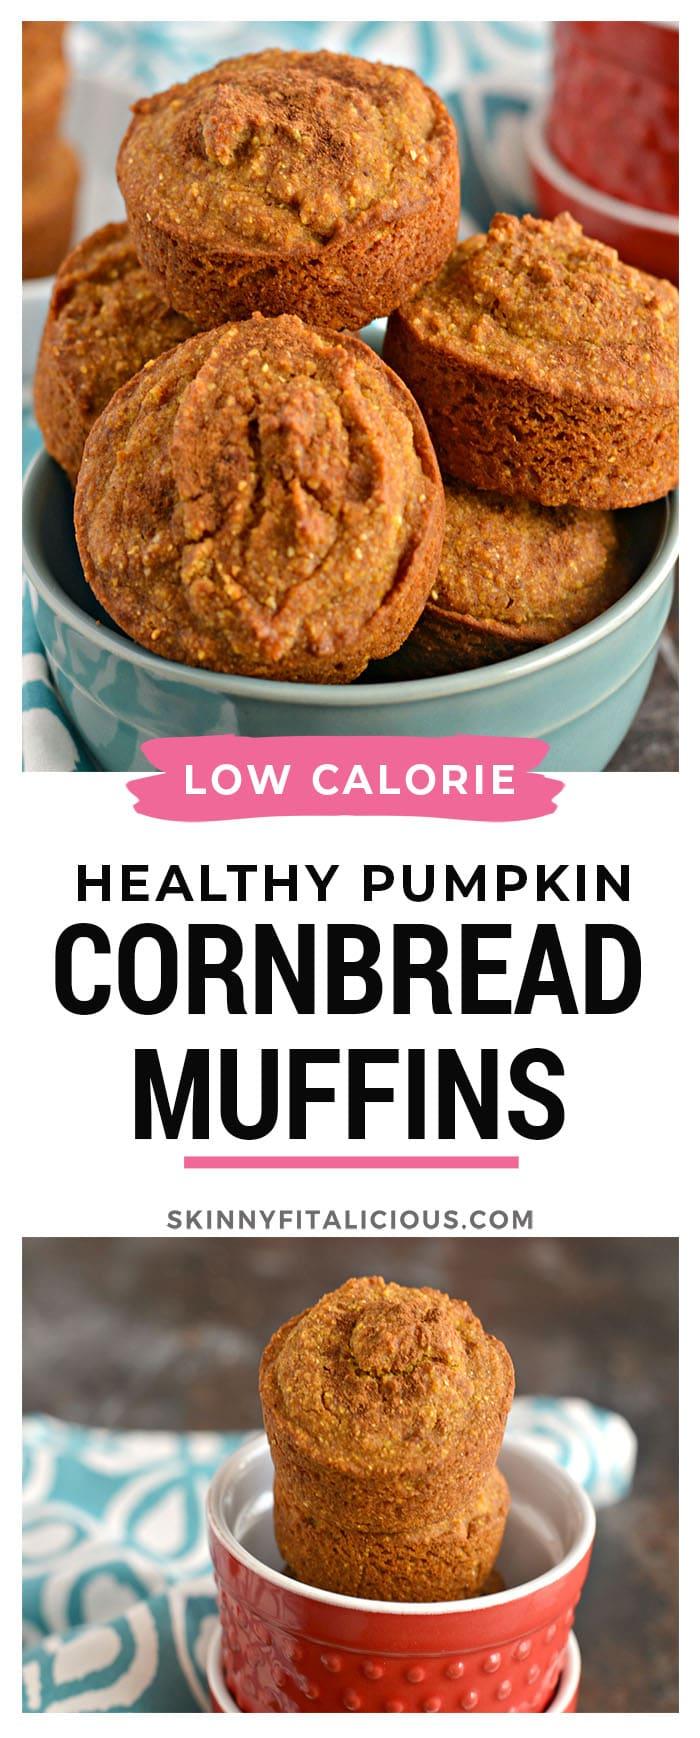 Skip the bread roll and pass the cornbread! These gluten free, vegan friendly Pumpkin Cornbread Muffins are denseand chewy thanks to its hiddenpumpkin ingredient.